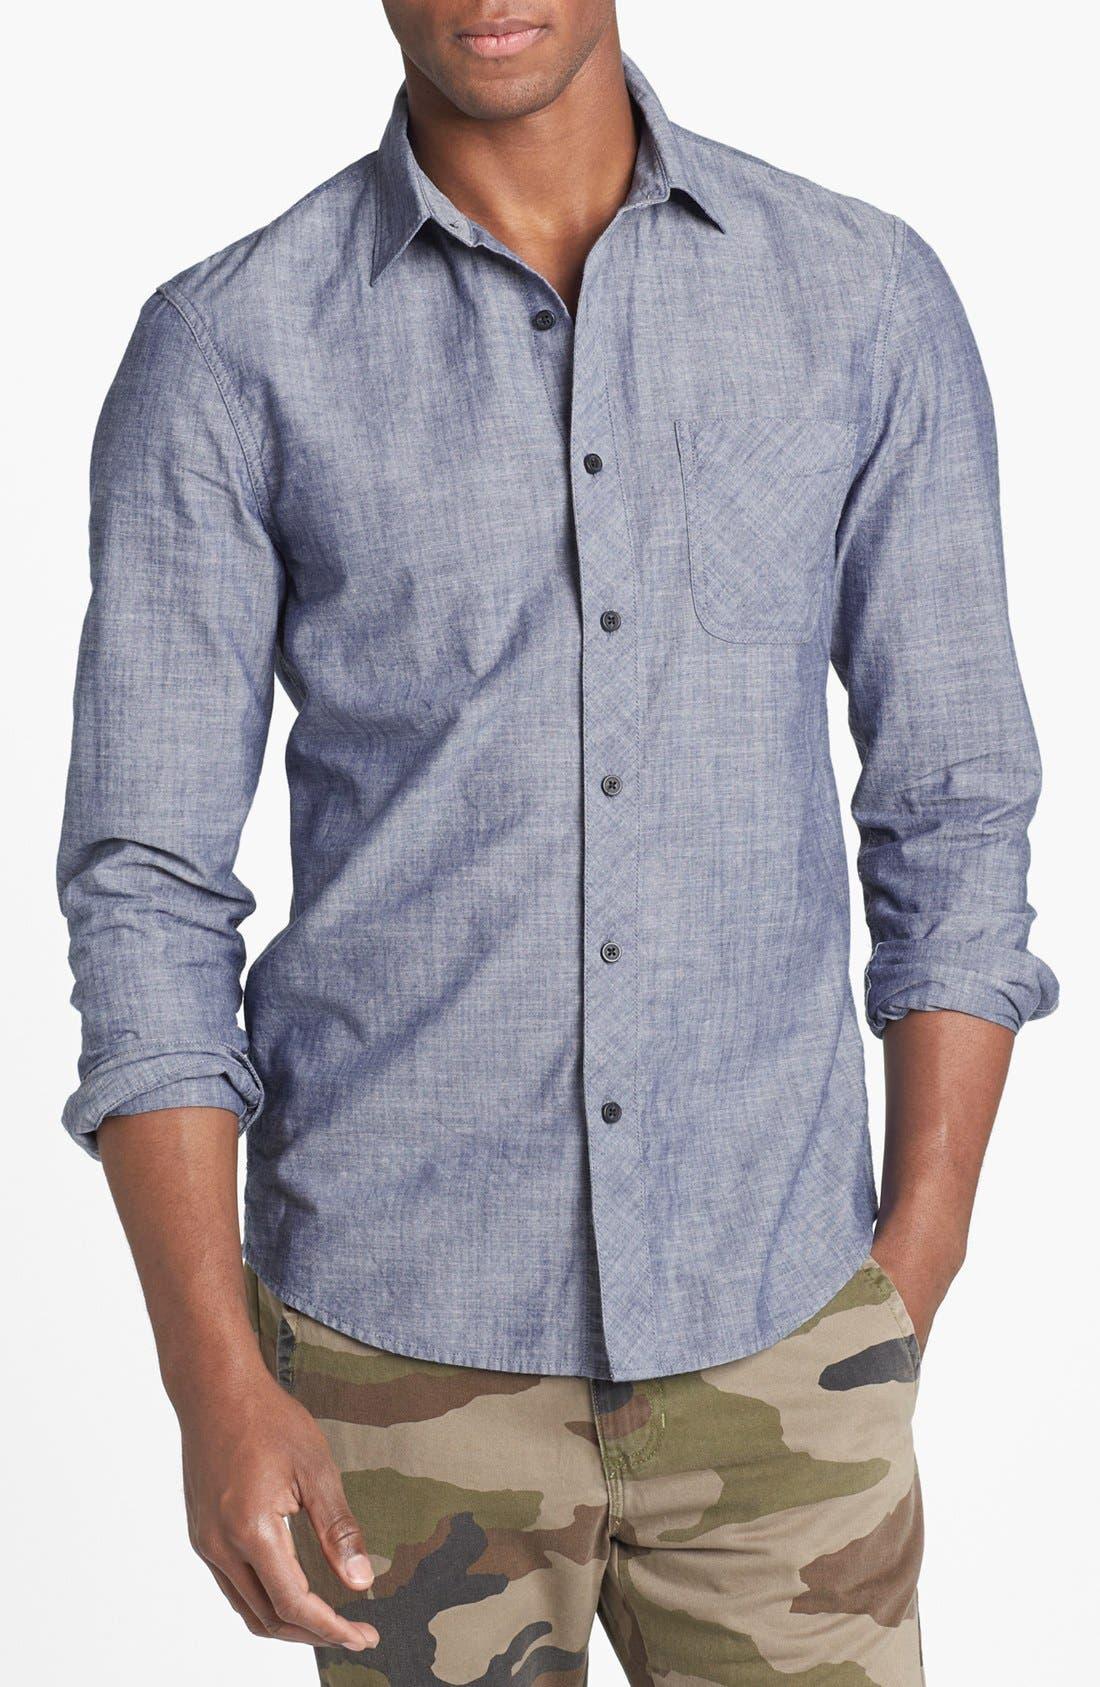 Alternate Image 1 Selected - 1901 Chambray Shirt